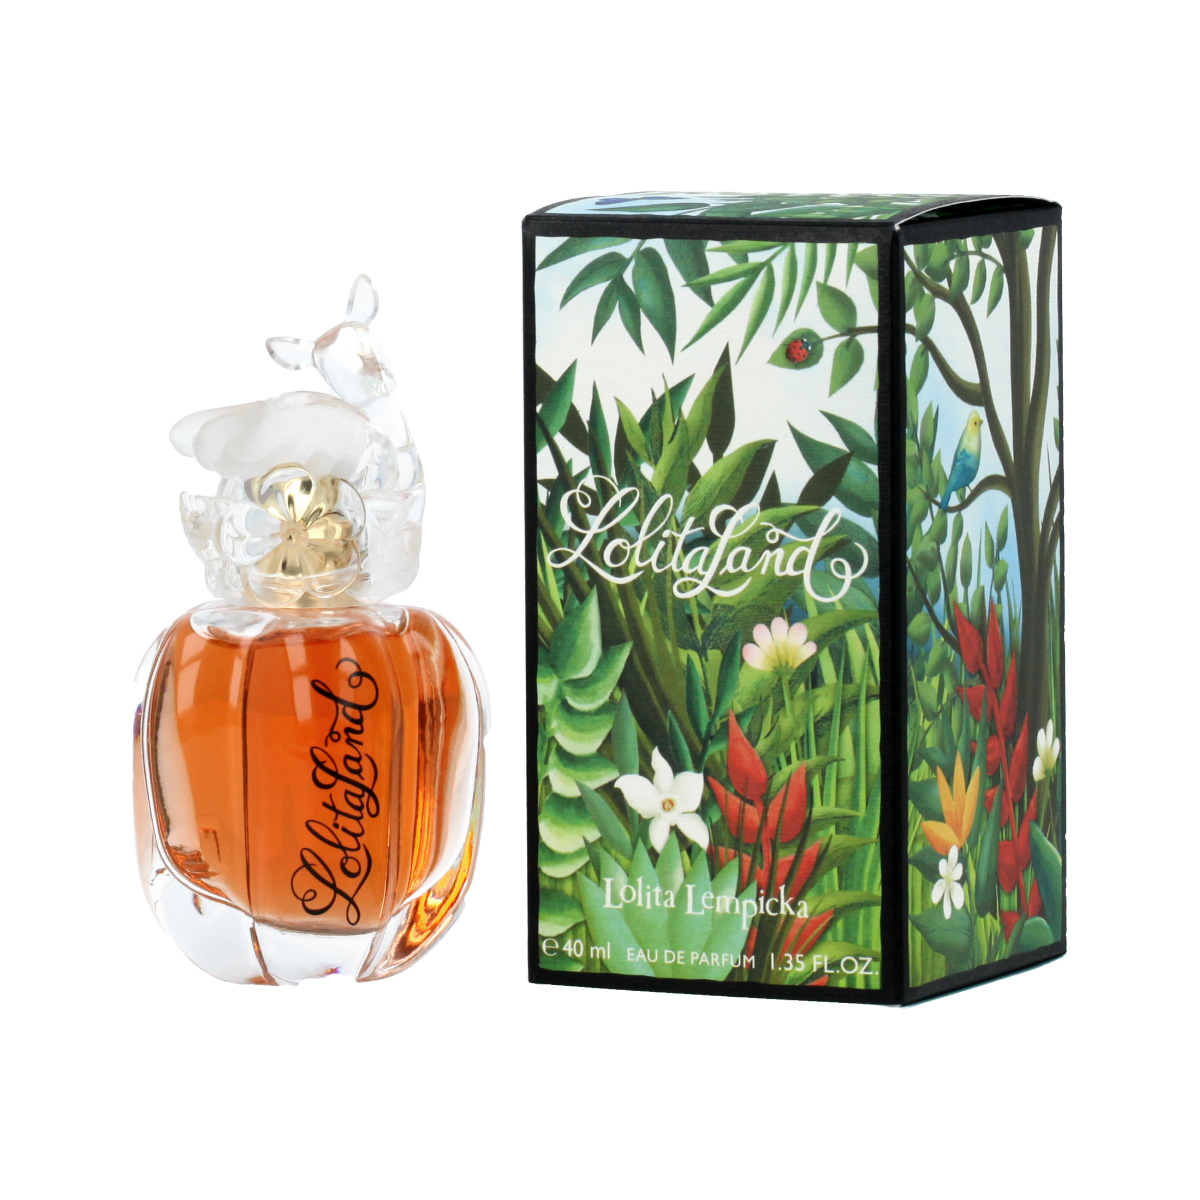 Lolita Lempicka LolitaLand Eau De Parfum 40 ml (woman) 12913